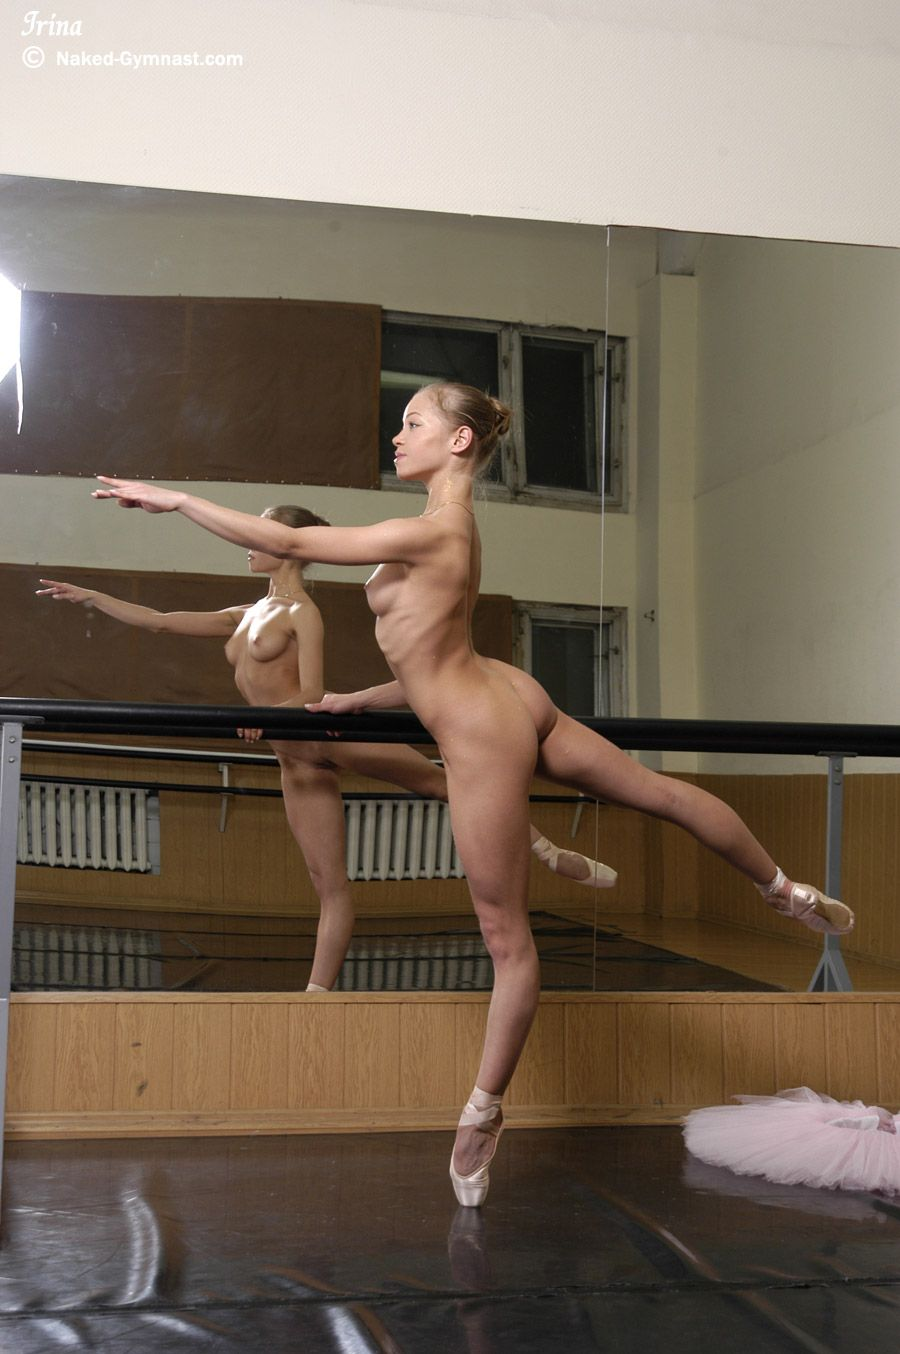 Irina naked gymnast - ballerina